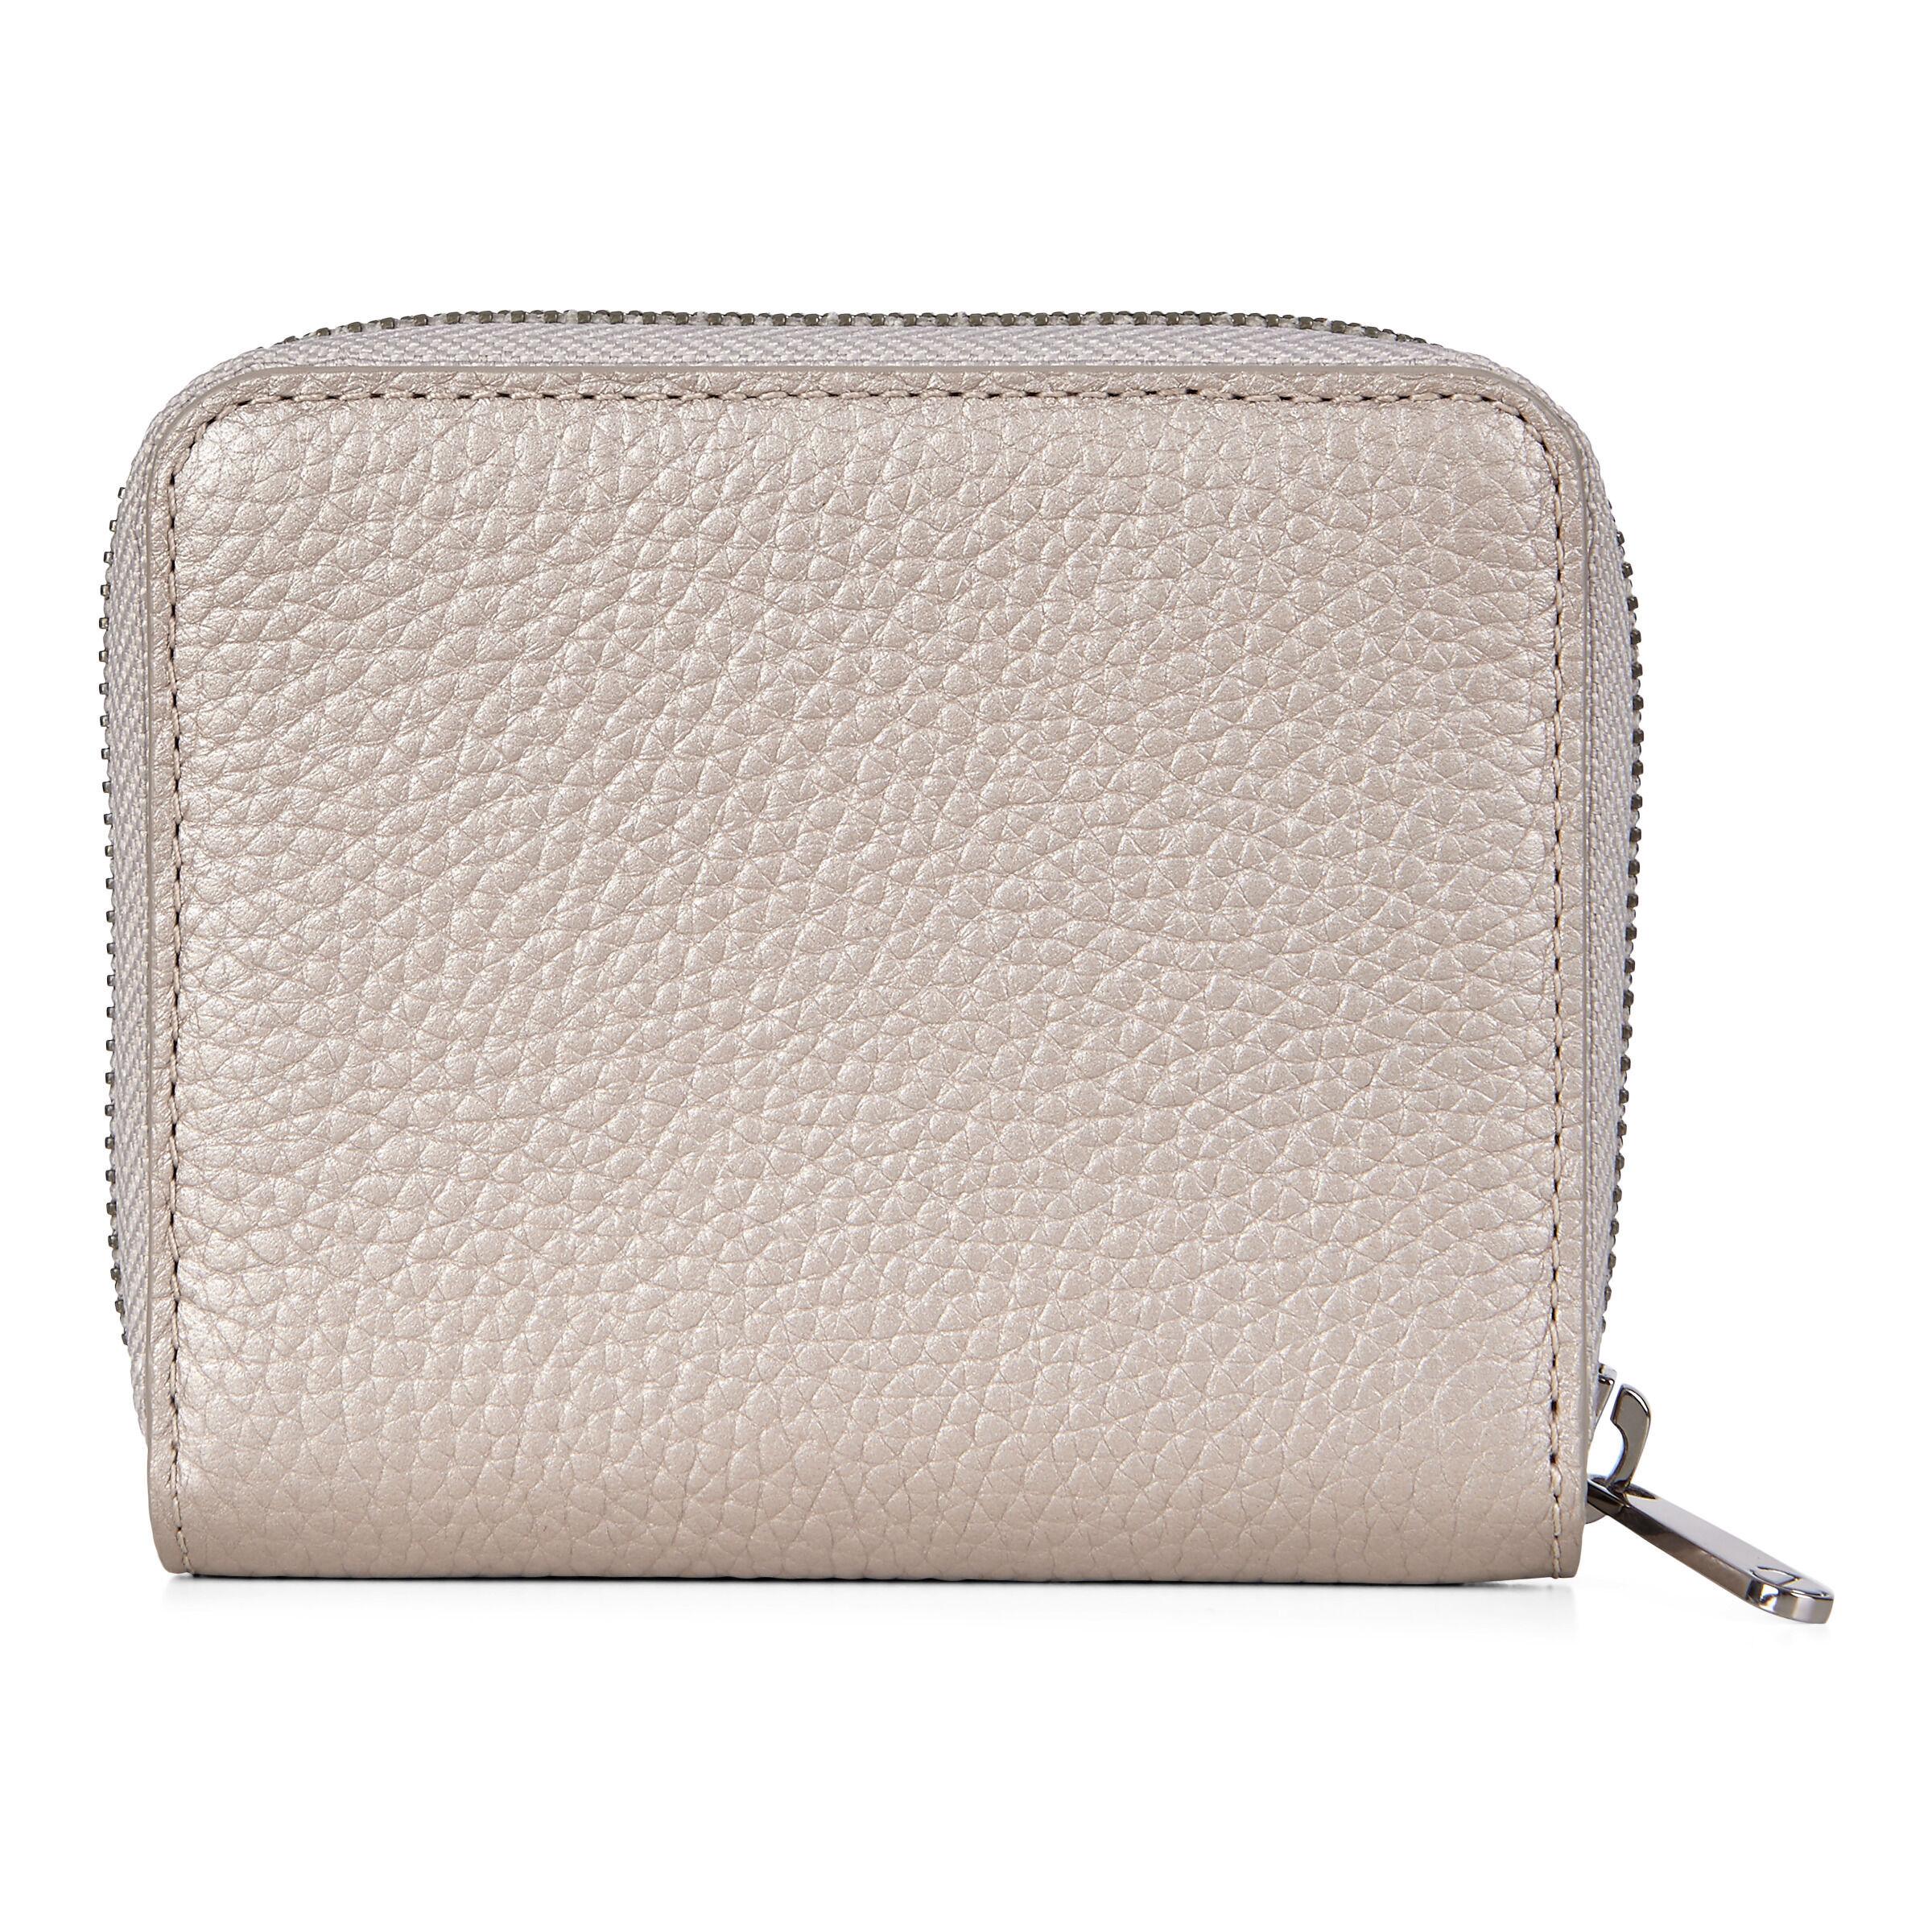 ECCO Sp 3 Small Zip Around Wallet: One Size - Grey Rose Metallic